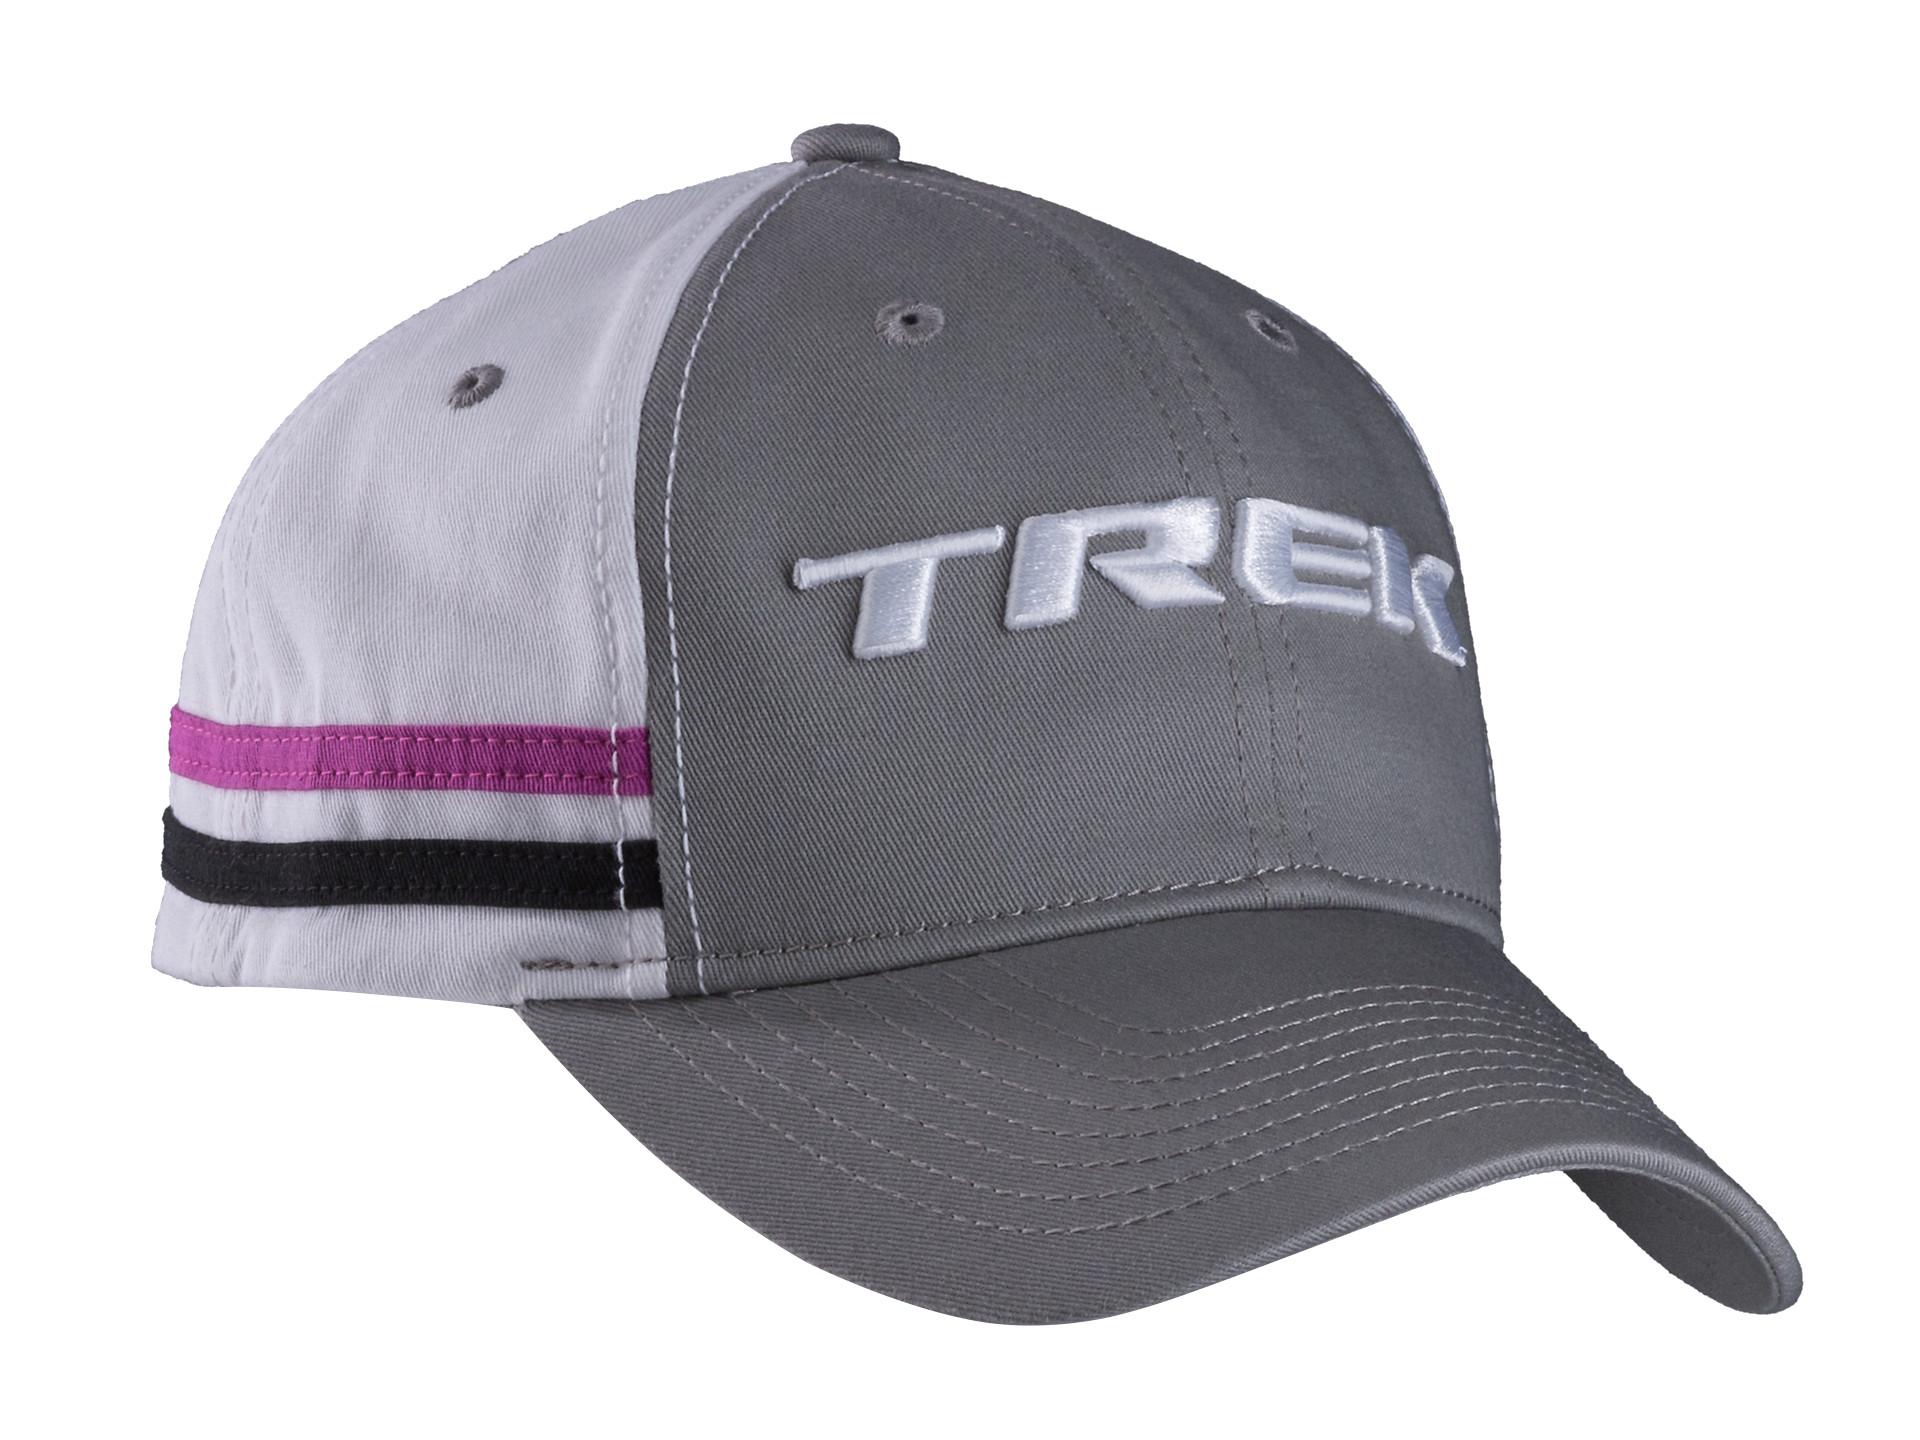 ac50224db03fc Trek Stripe Women s Cap